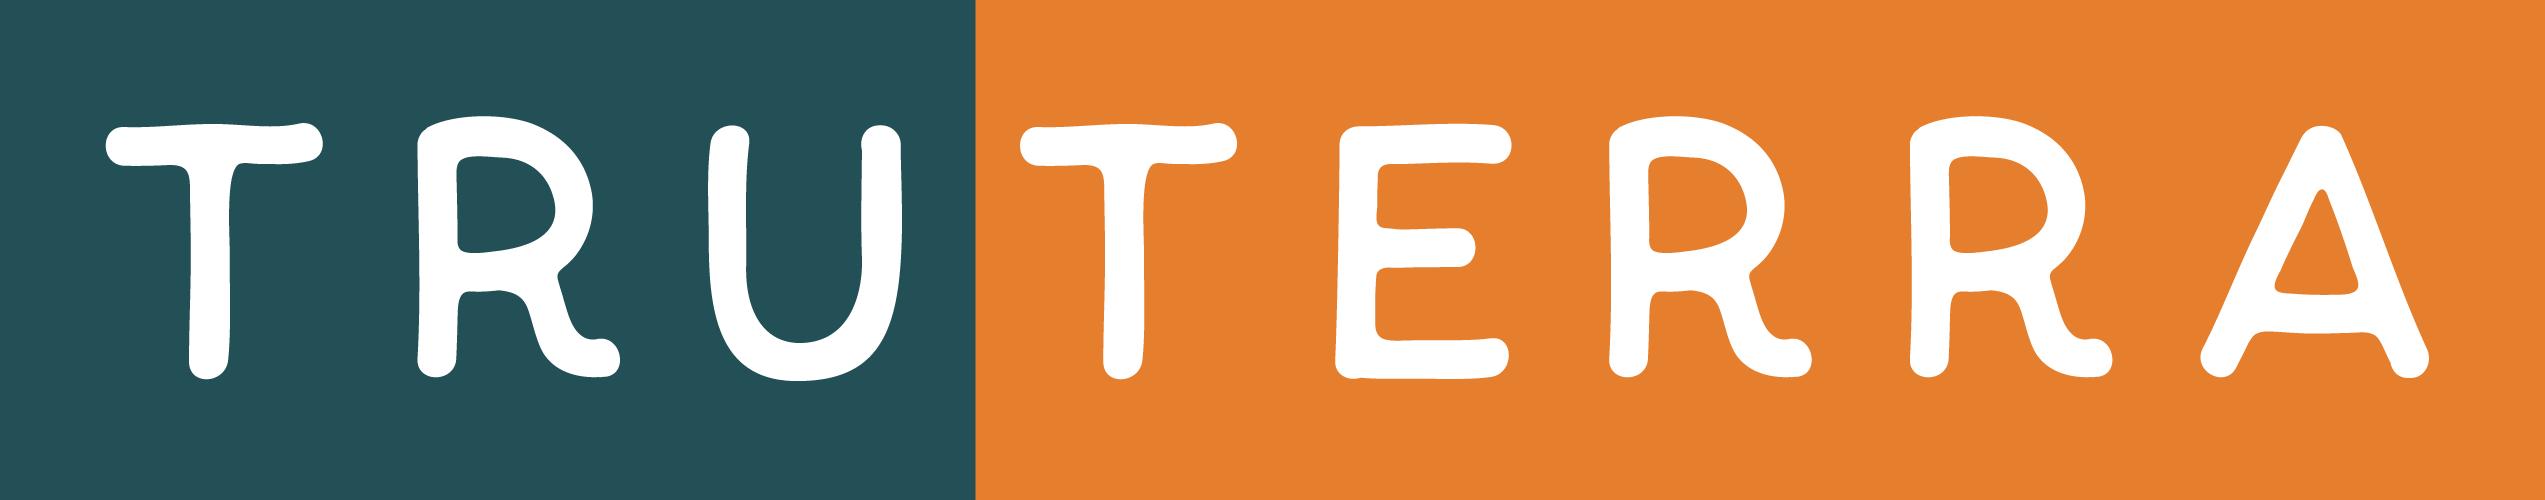 Truterra Logo